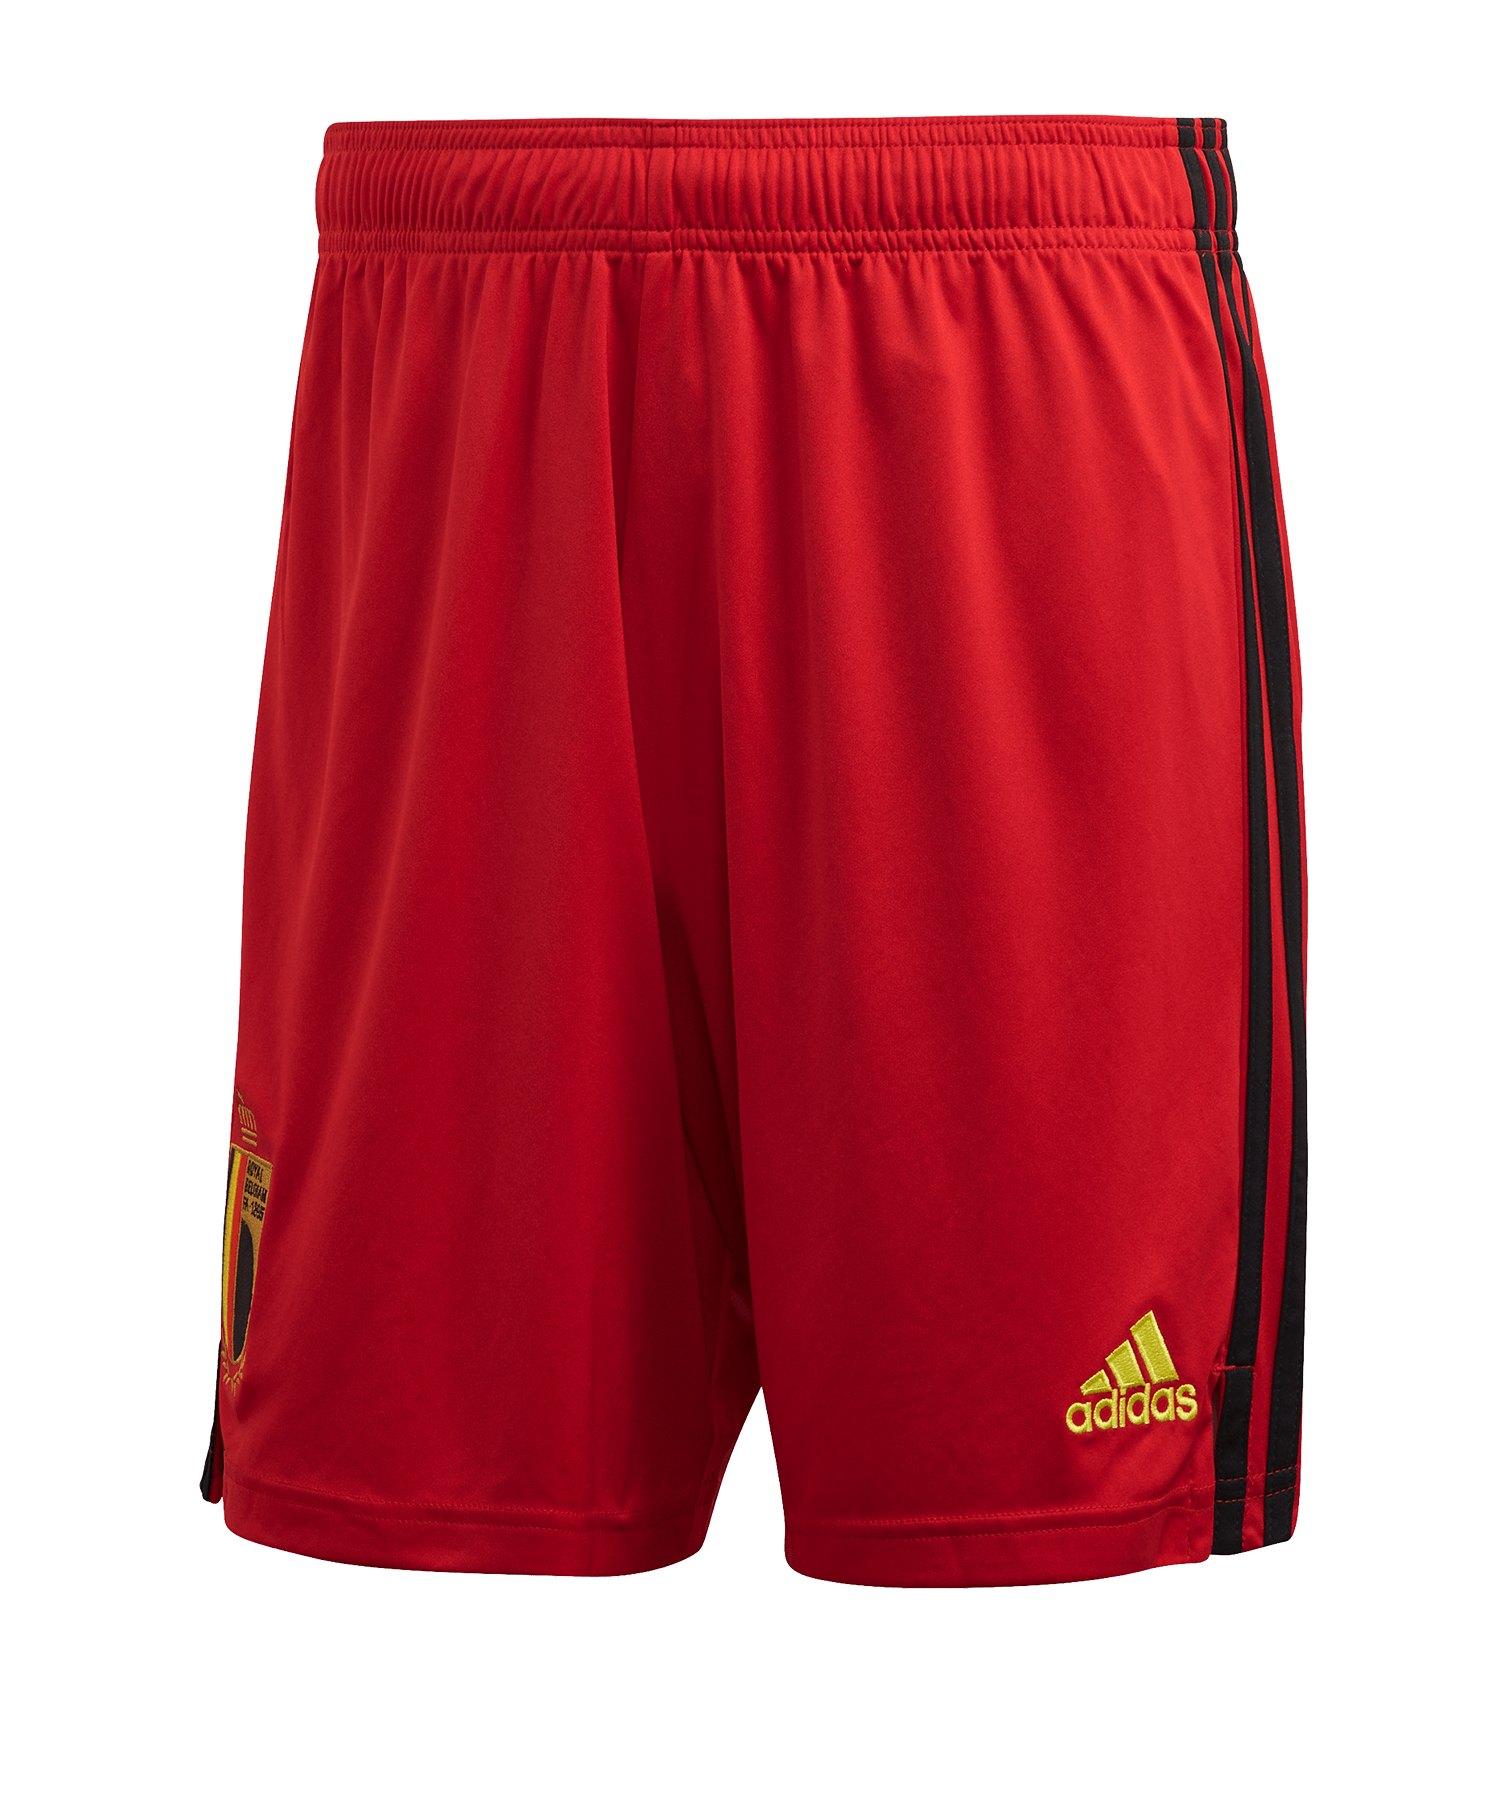 adidas Belgien Short Home EM 2020 Rot - rot